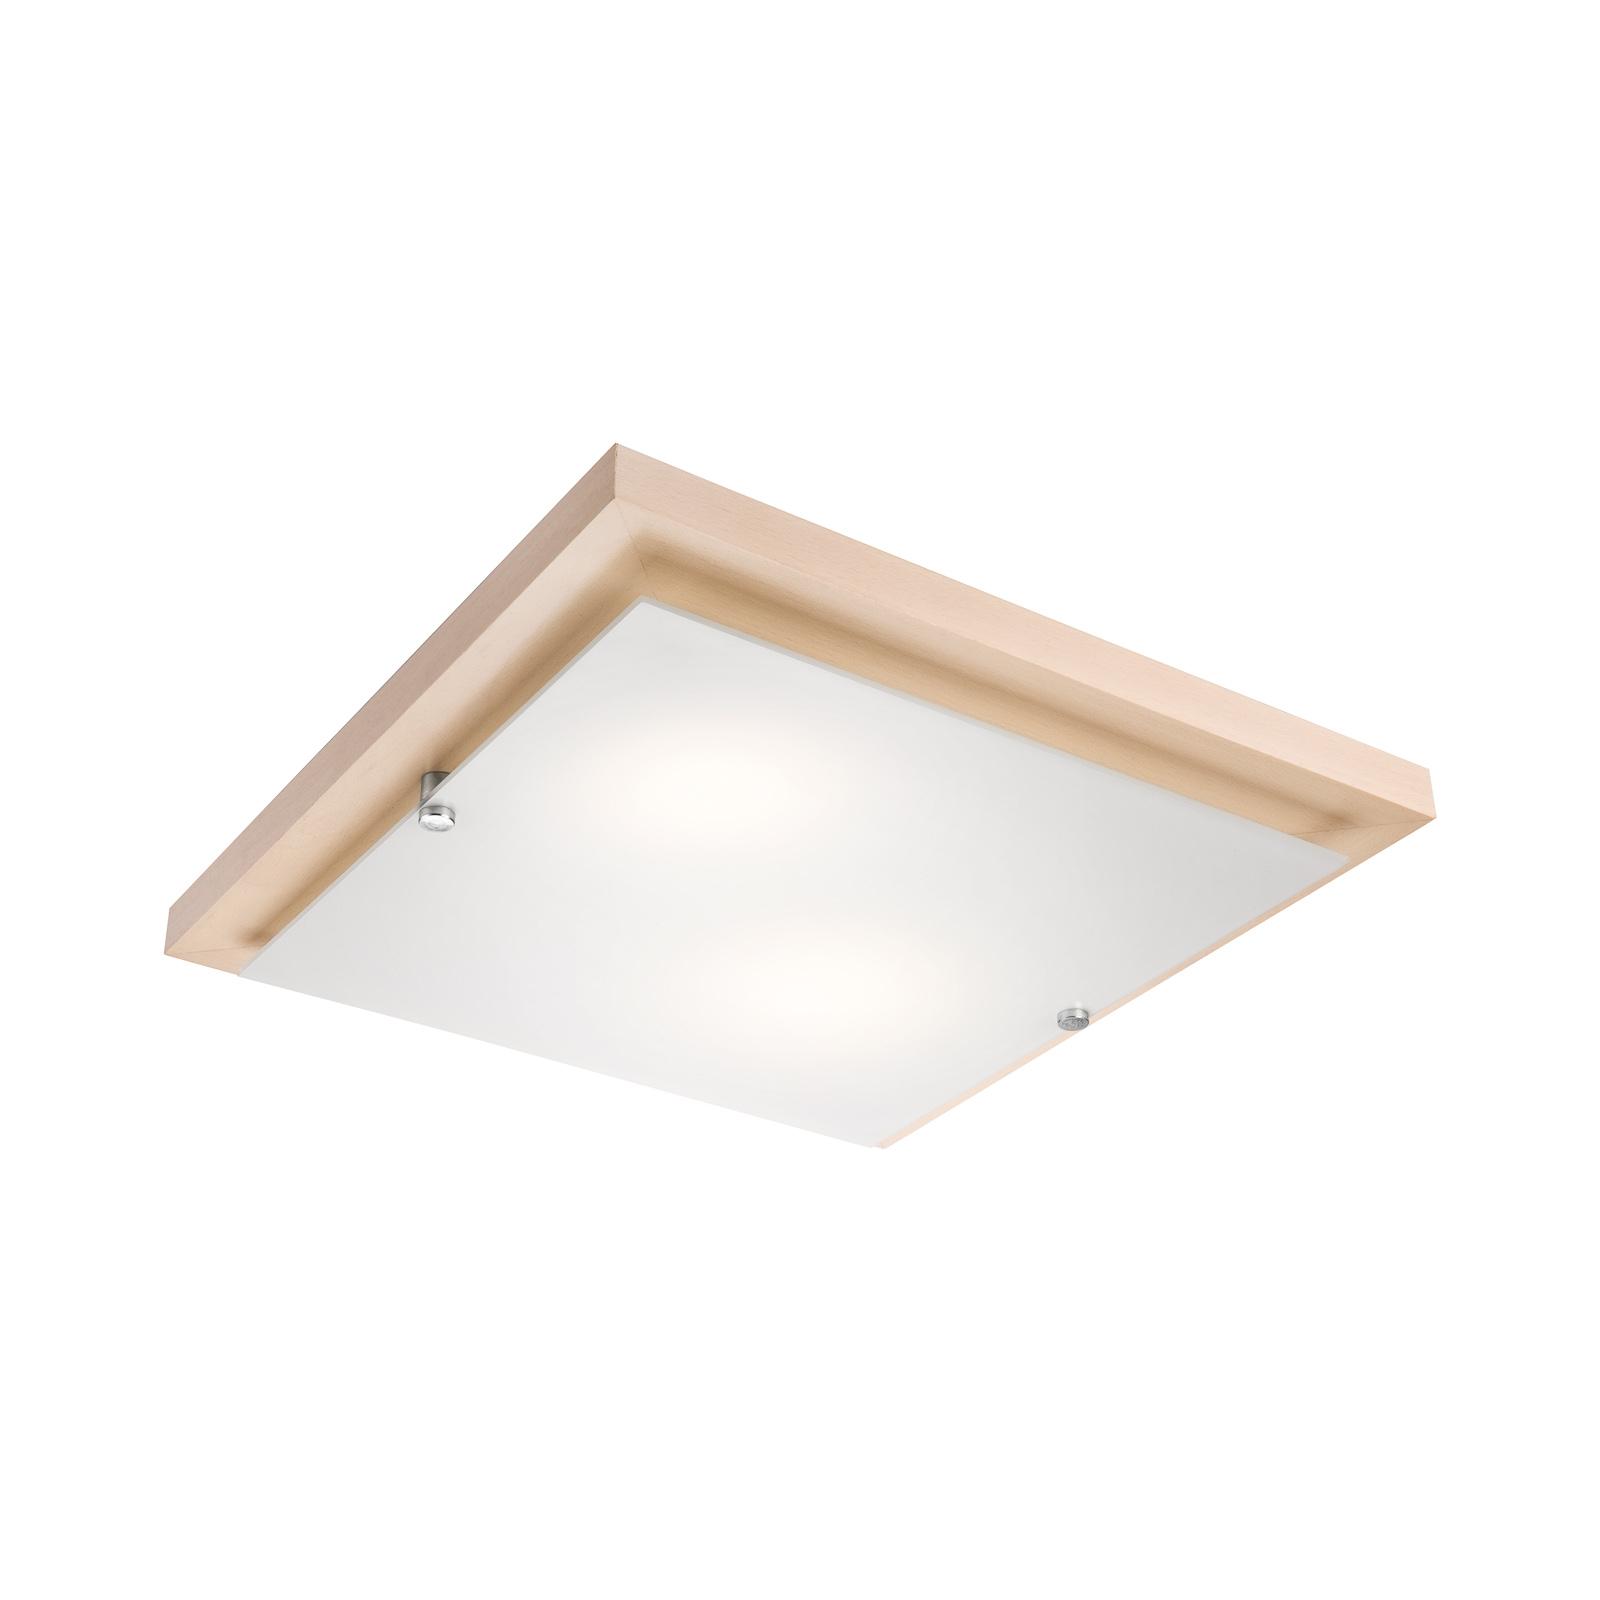 Deckenlampe Kerio, 35x35 cm, Kiefer natur